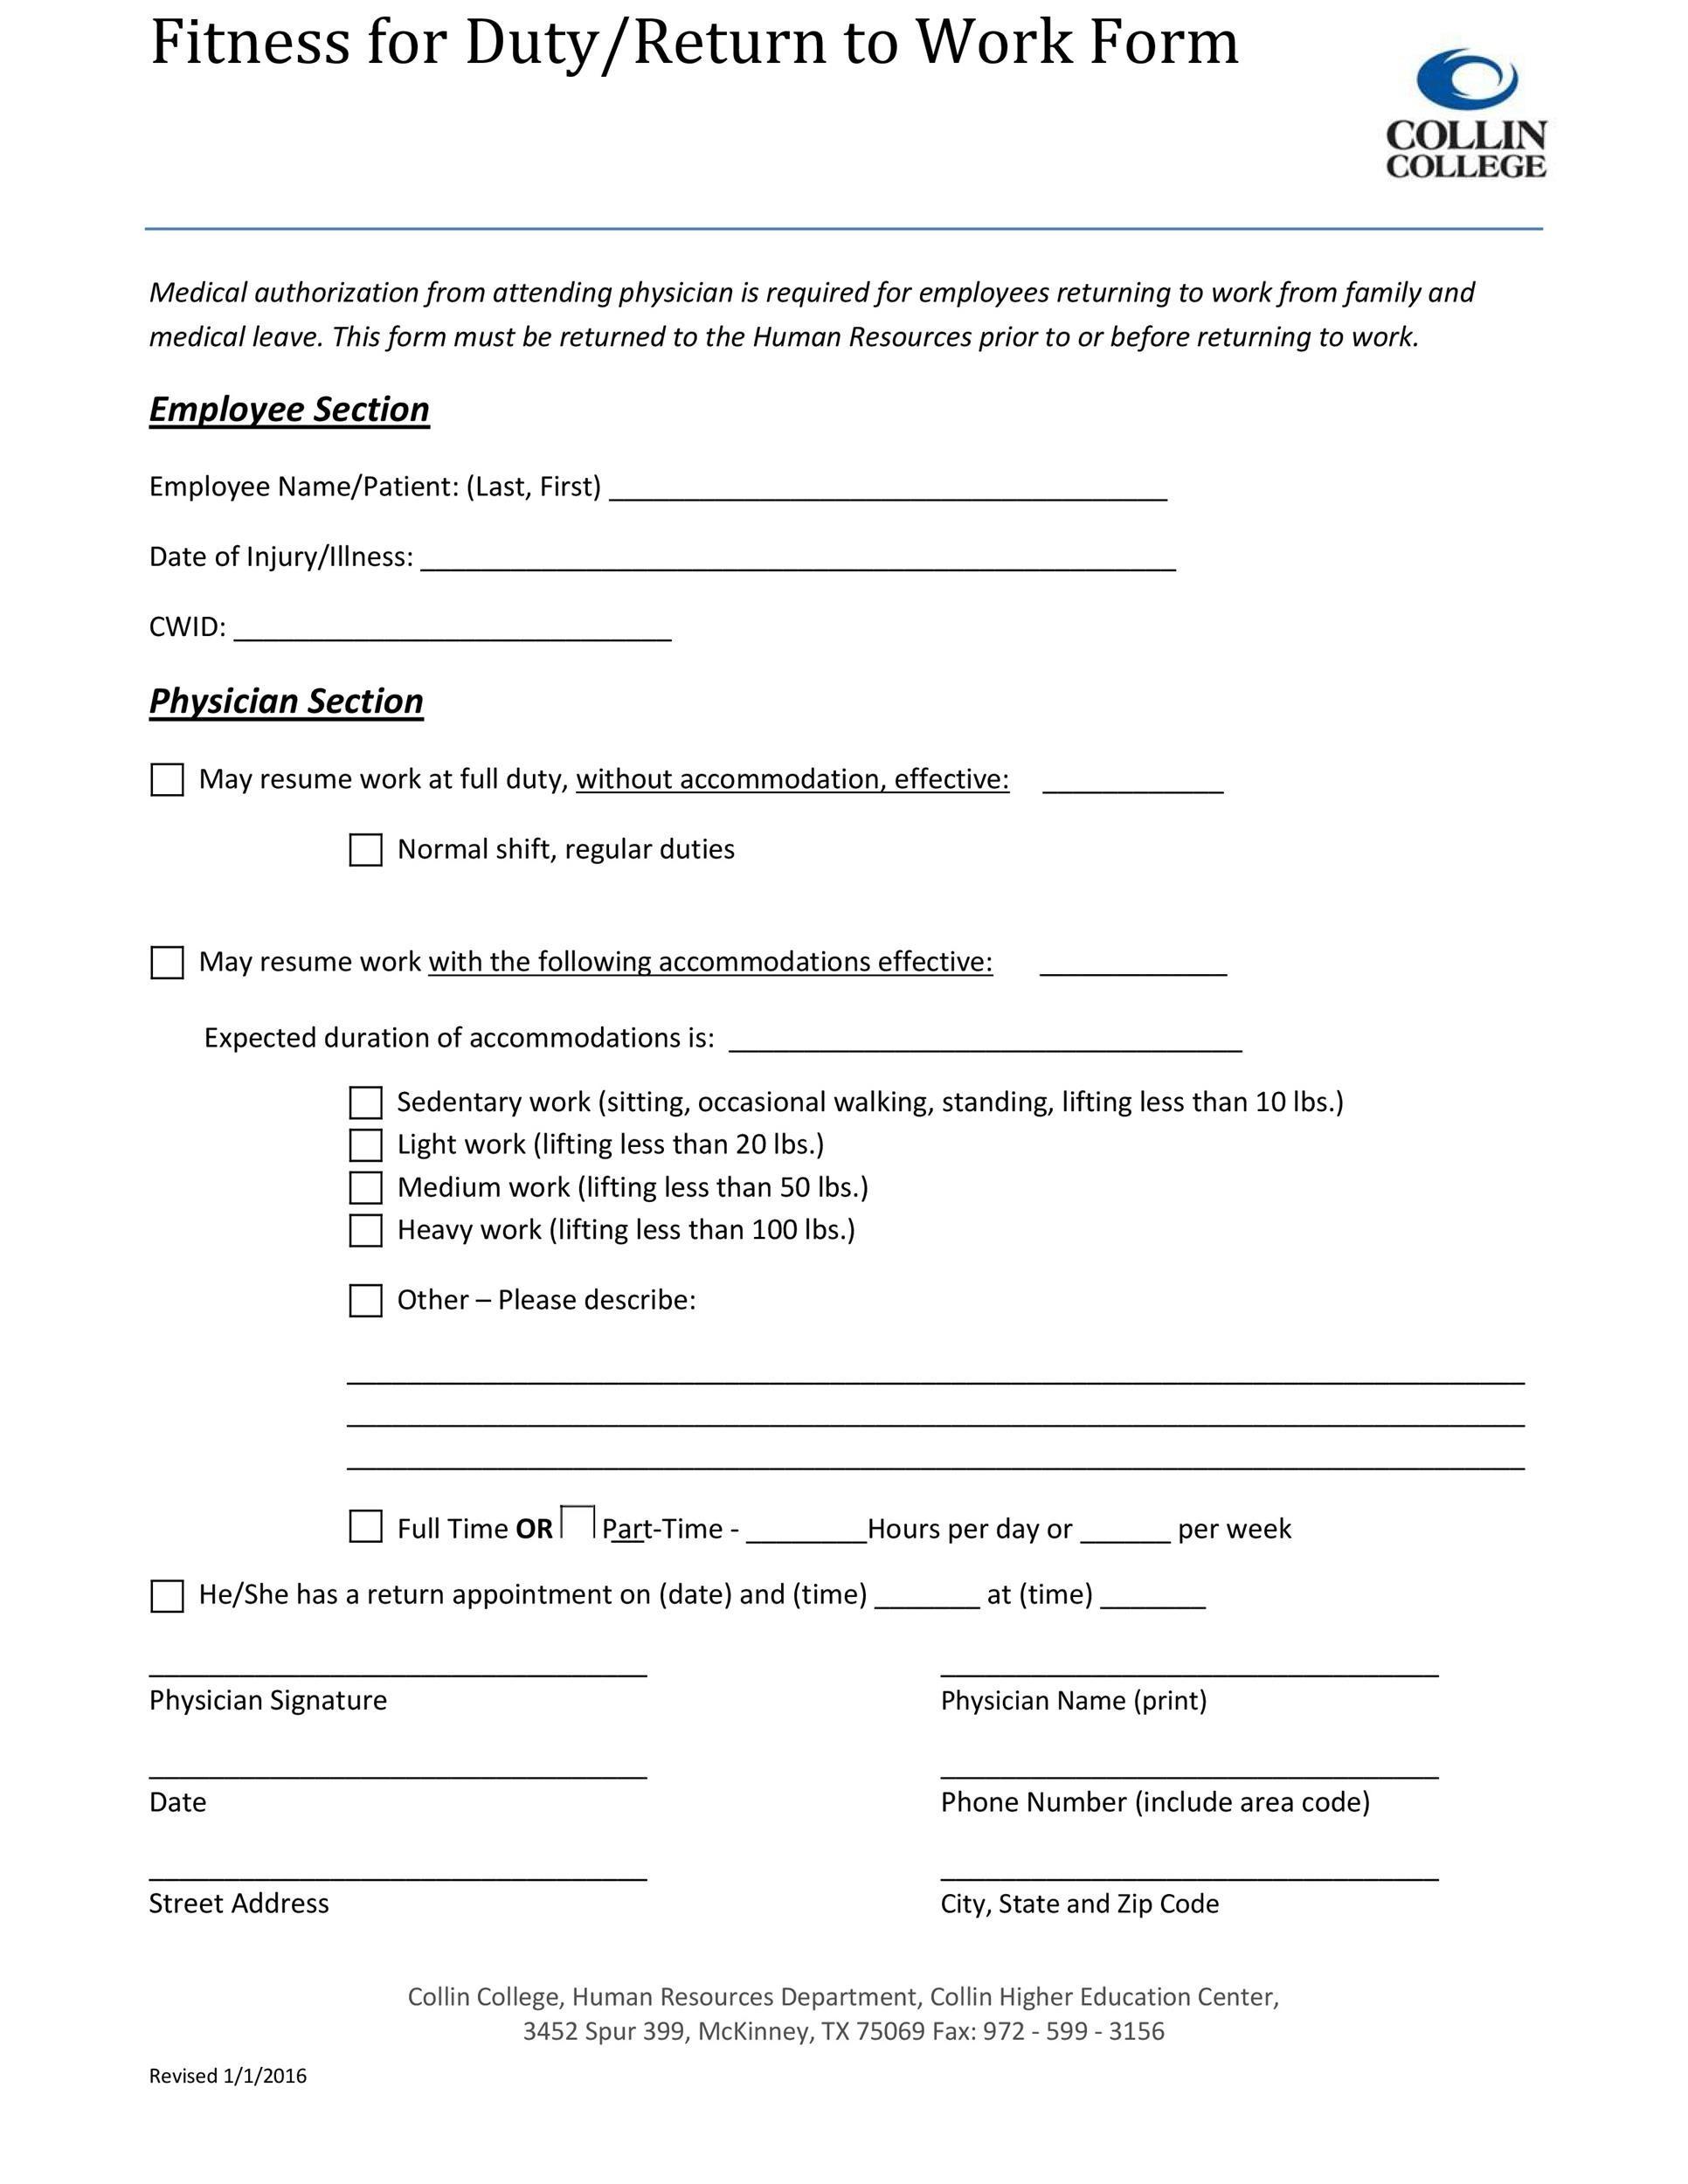 Free return to work form 33